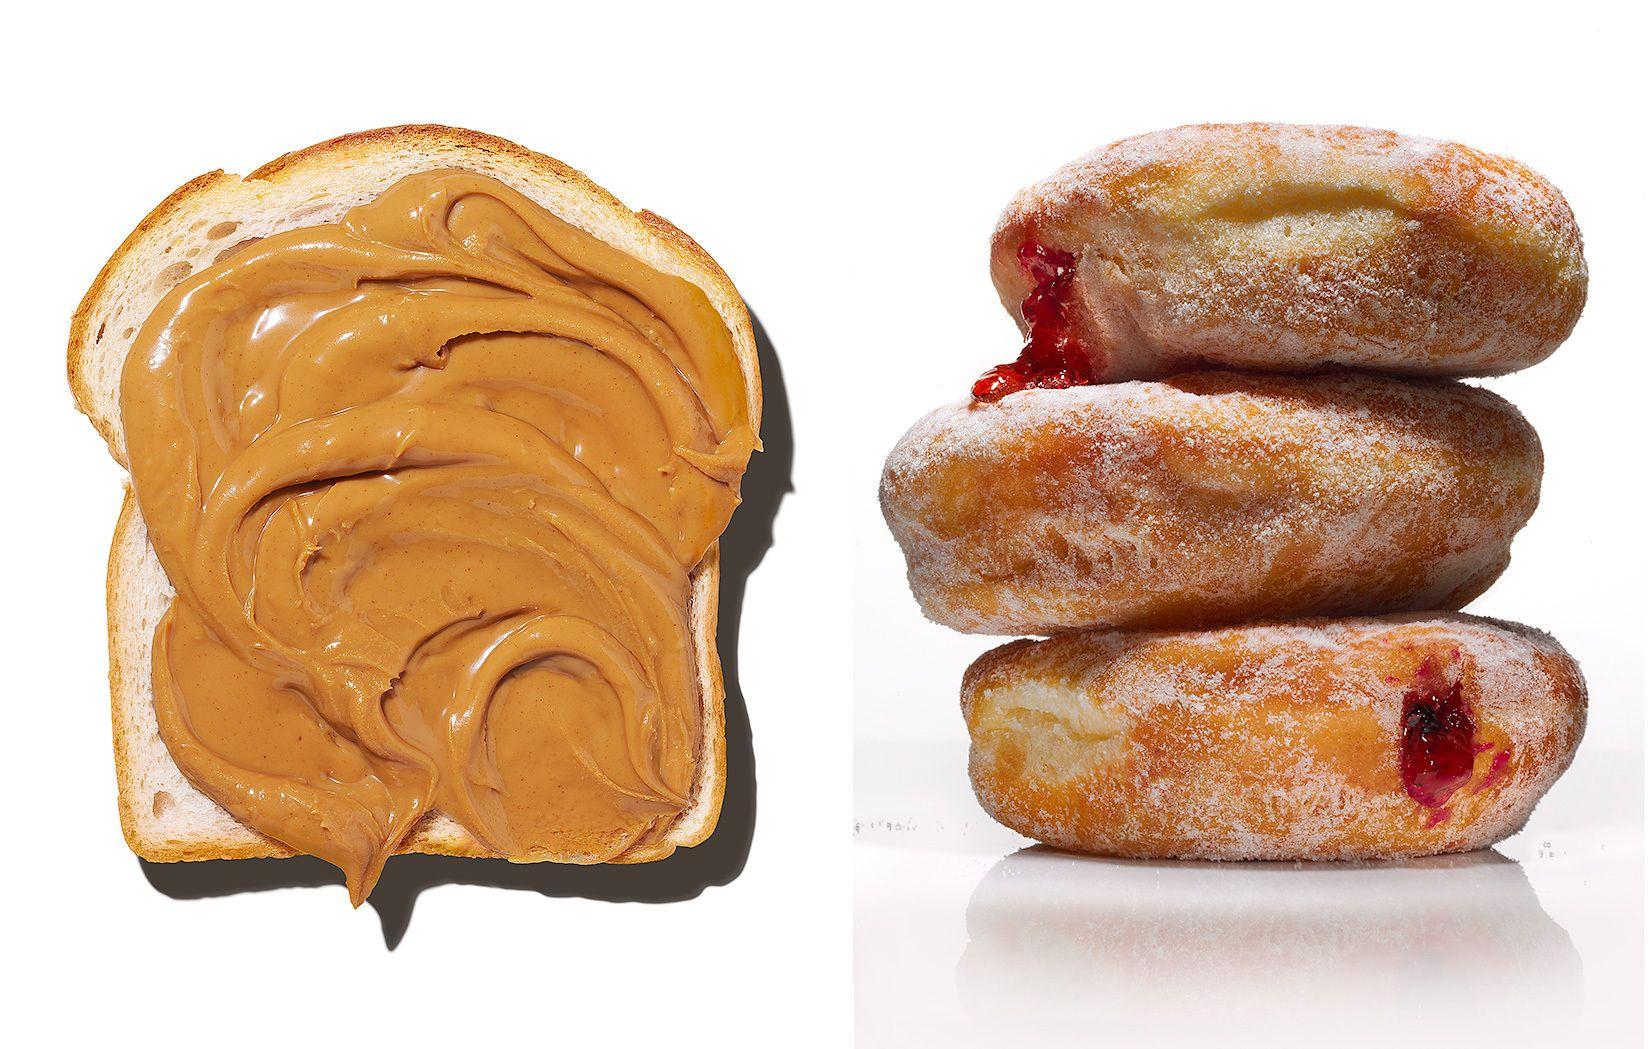 Peanut_Butter_Donut Spread